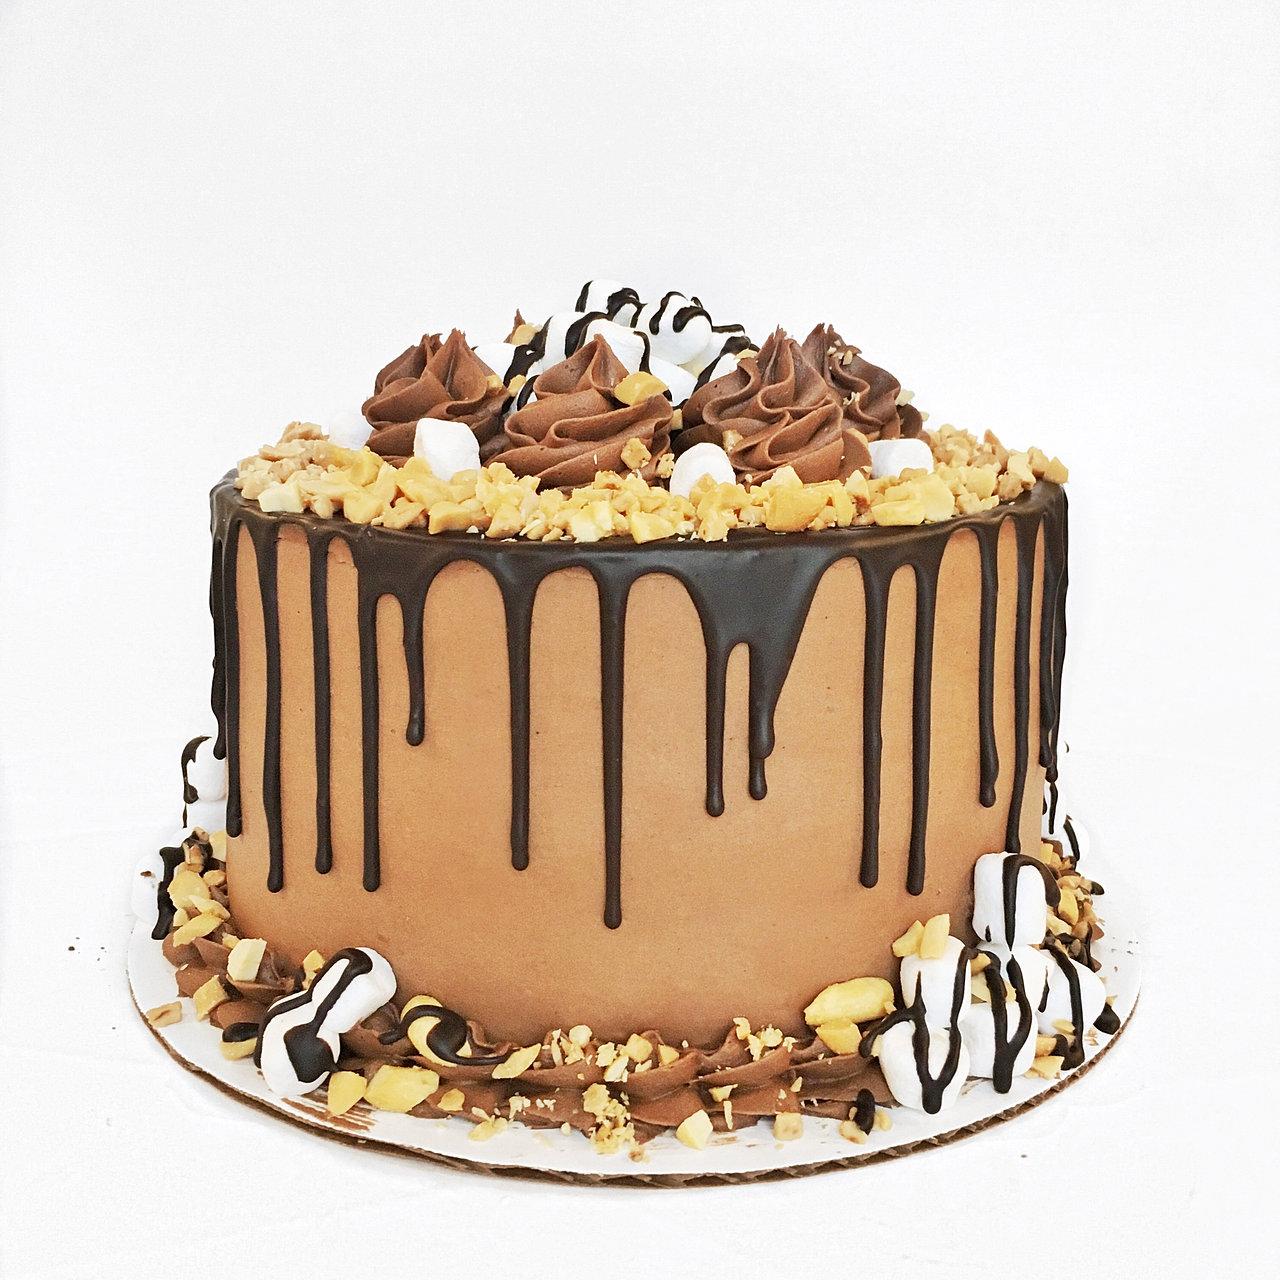 Decorated German Chocolate Cake Cake By Courtney